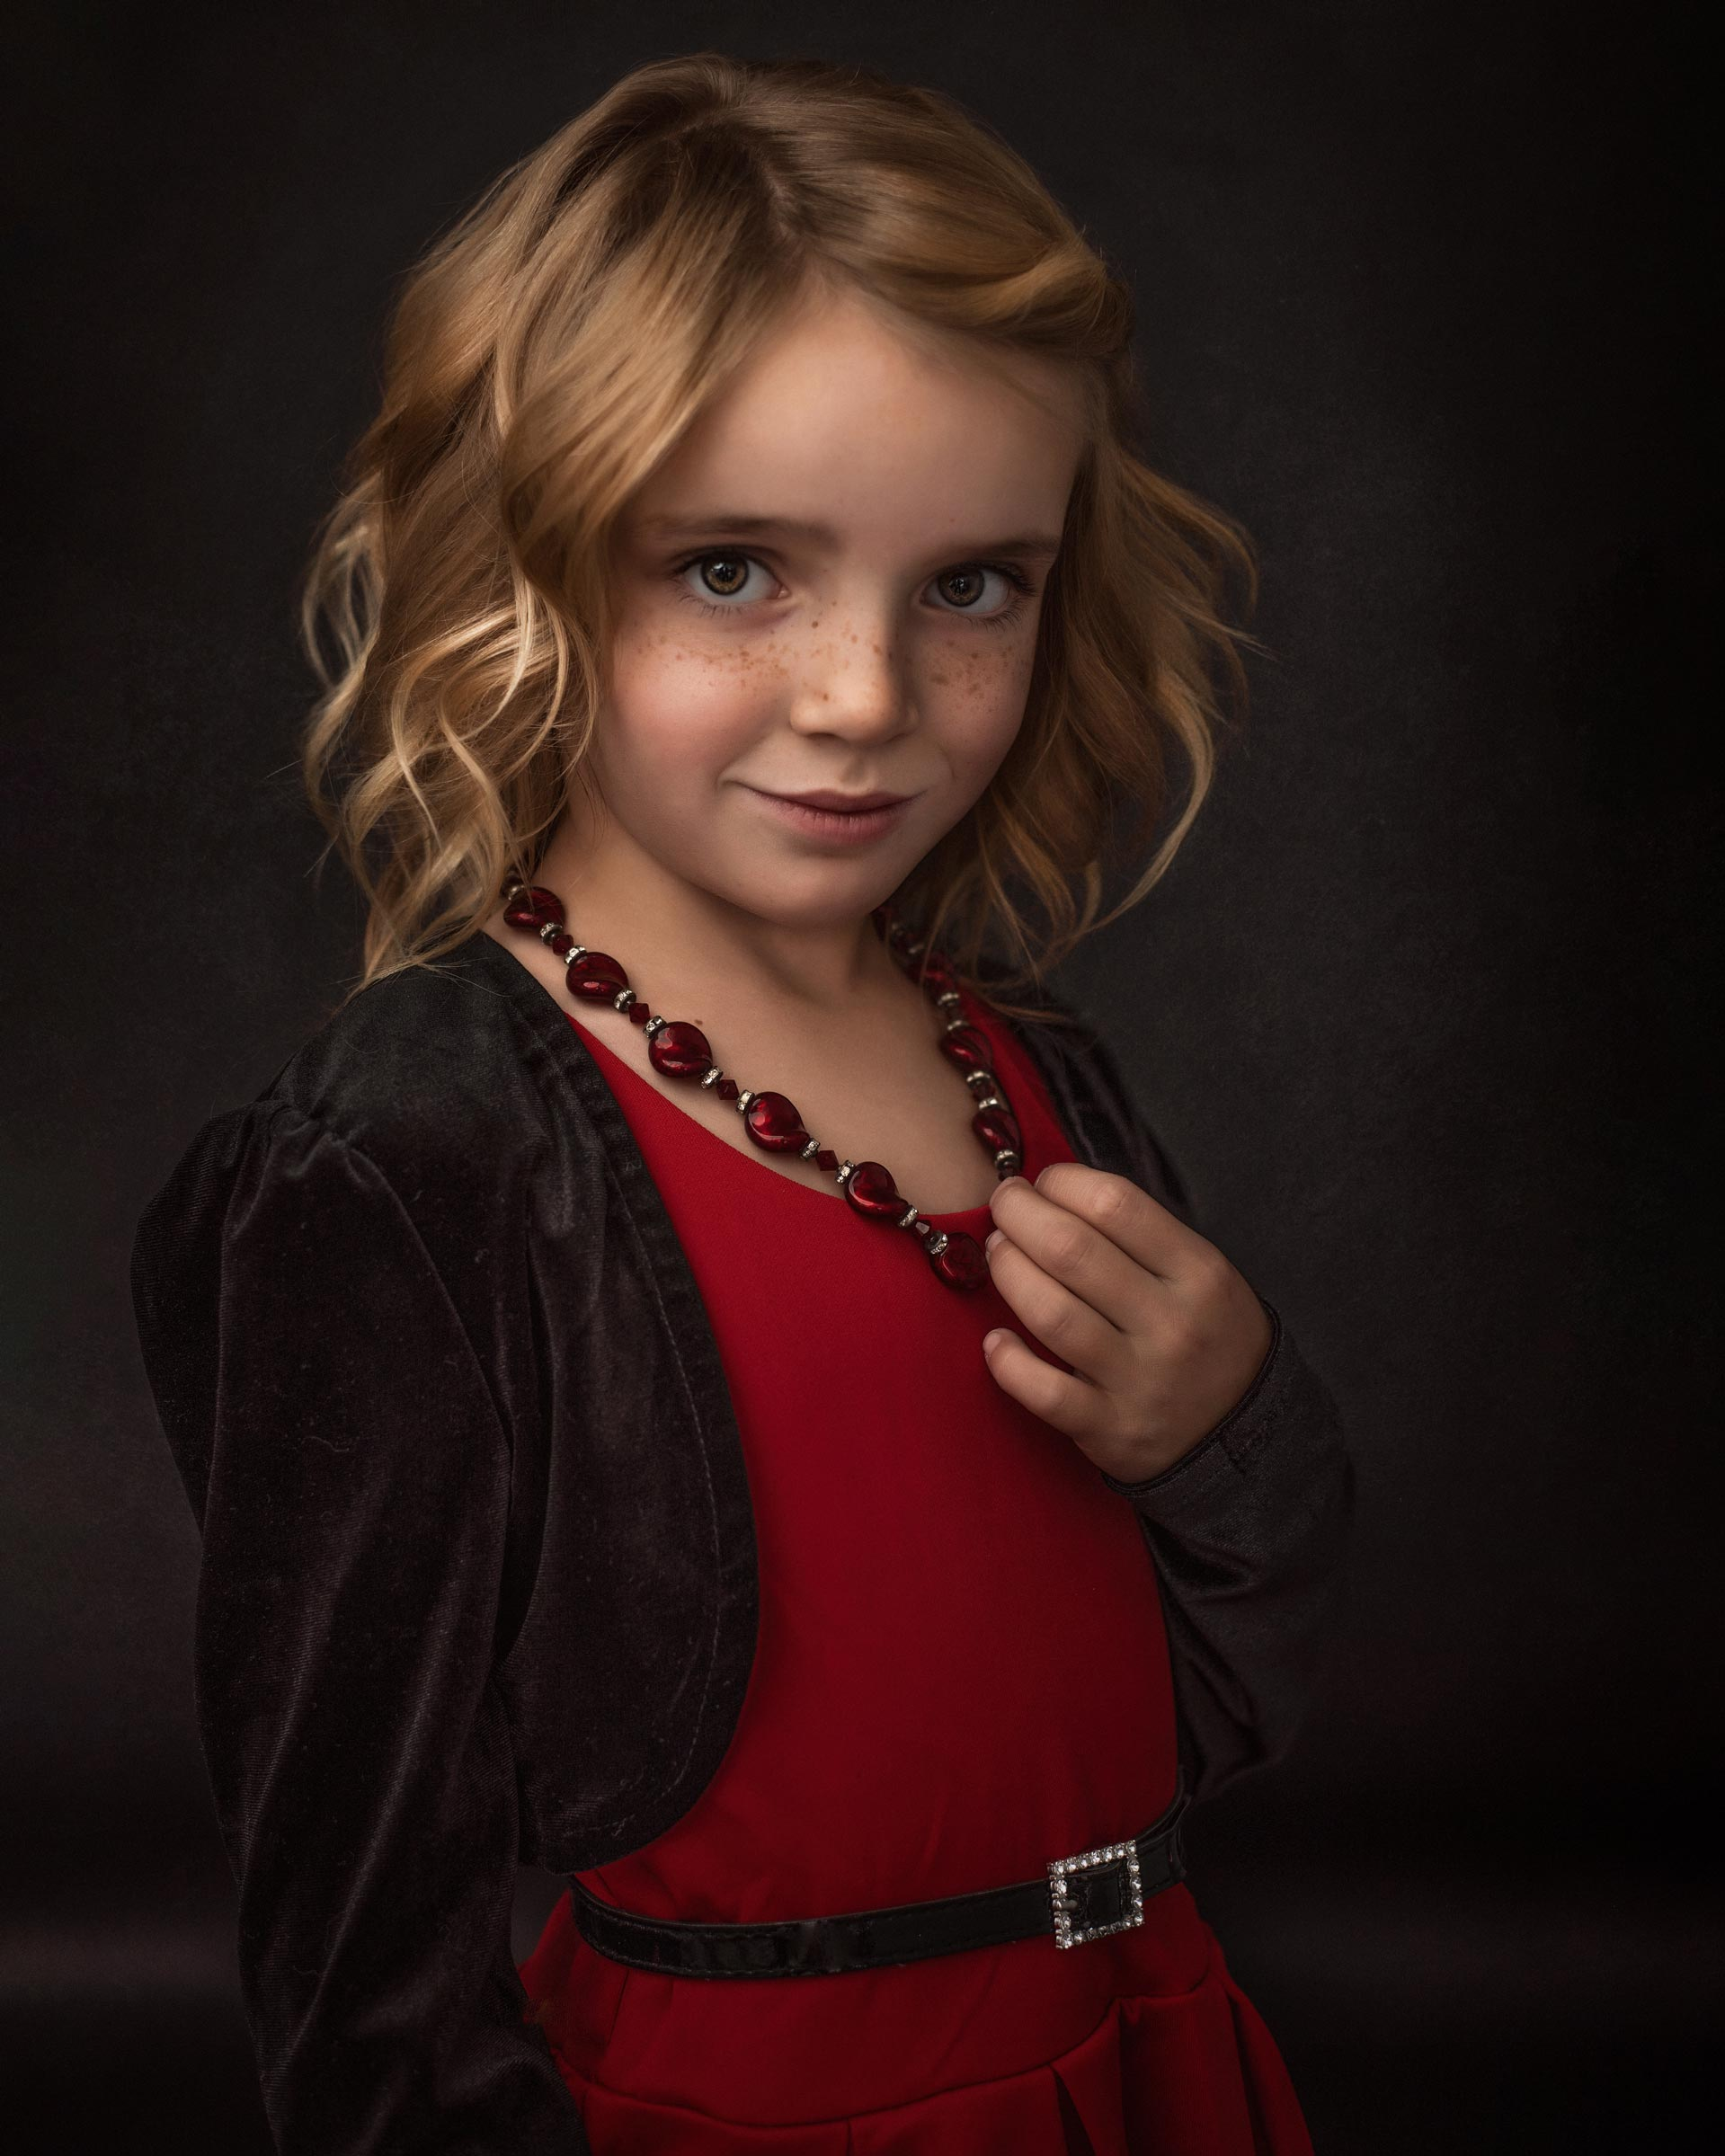 barbara_macferrin_photography_boulder_colorado_80303_fine_art_children_red_dress.jpg